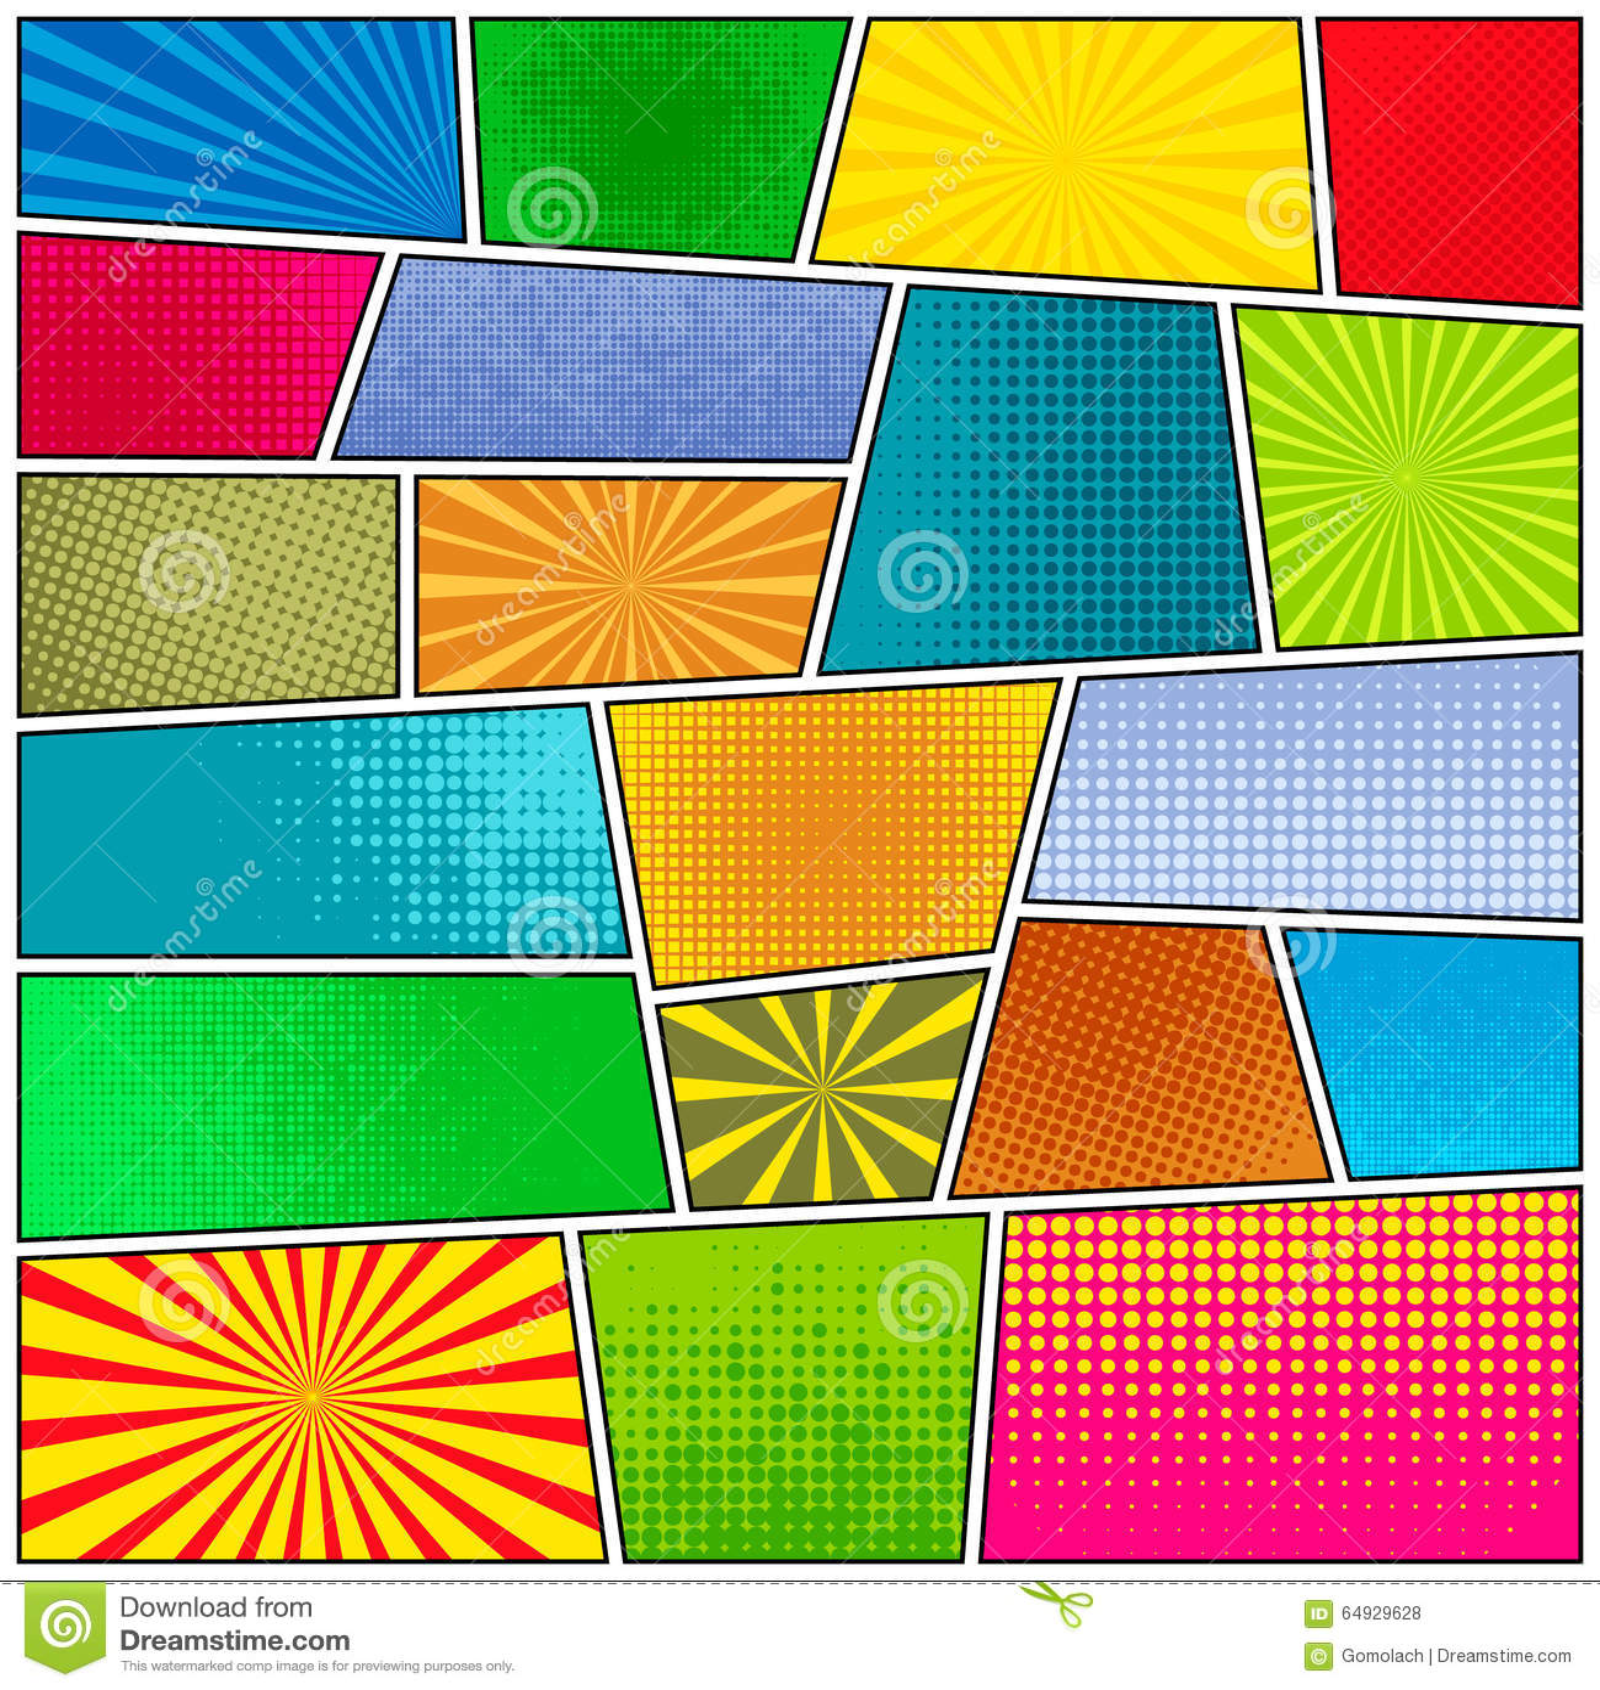 Custom Card Template superhero id card template : Comic strip background. Pop-art style. Vector EPS10 illustration